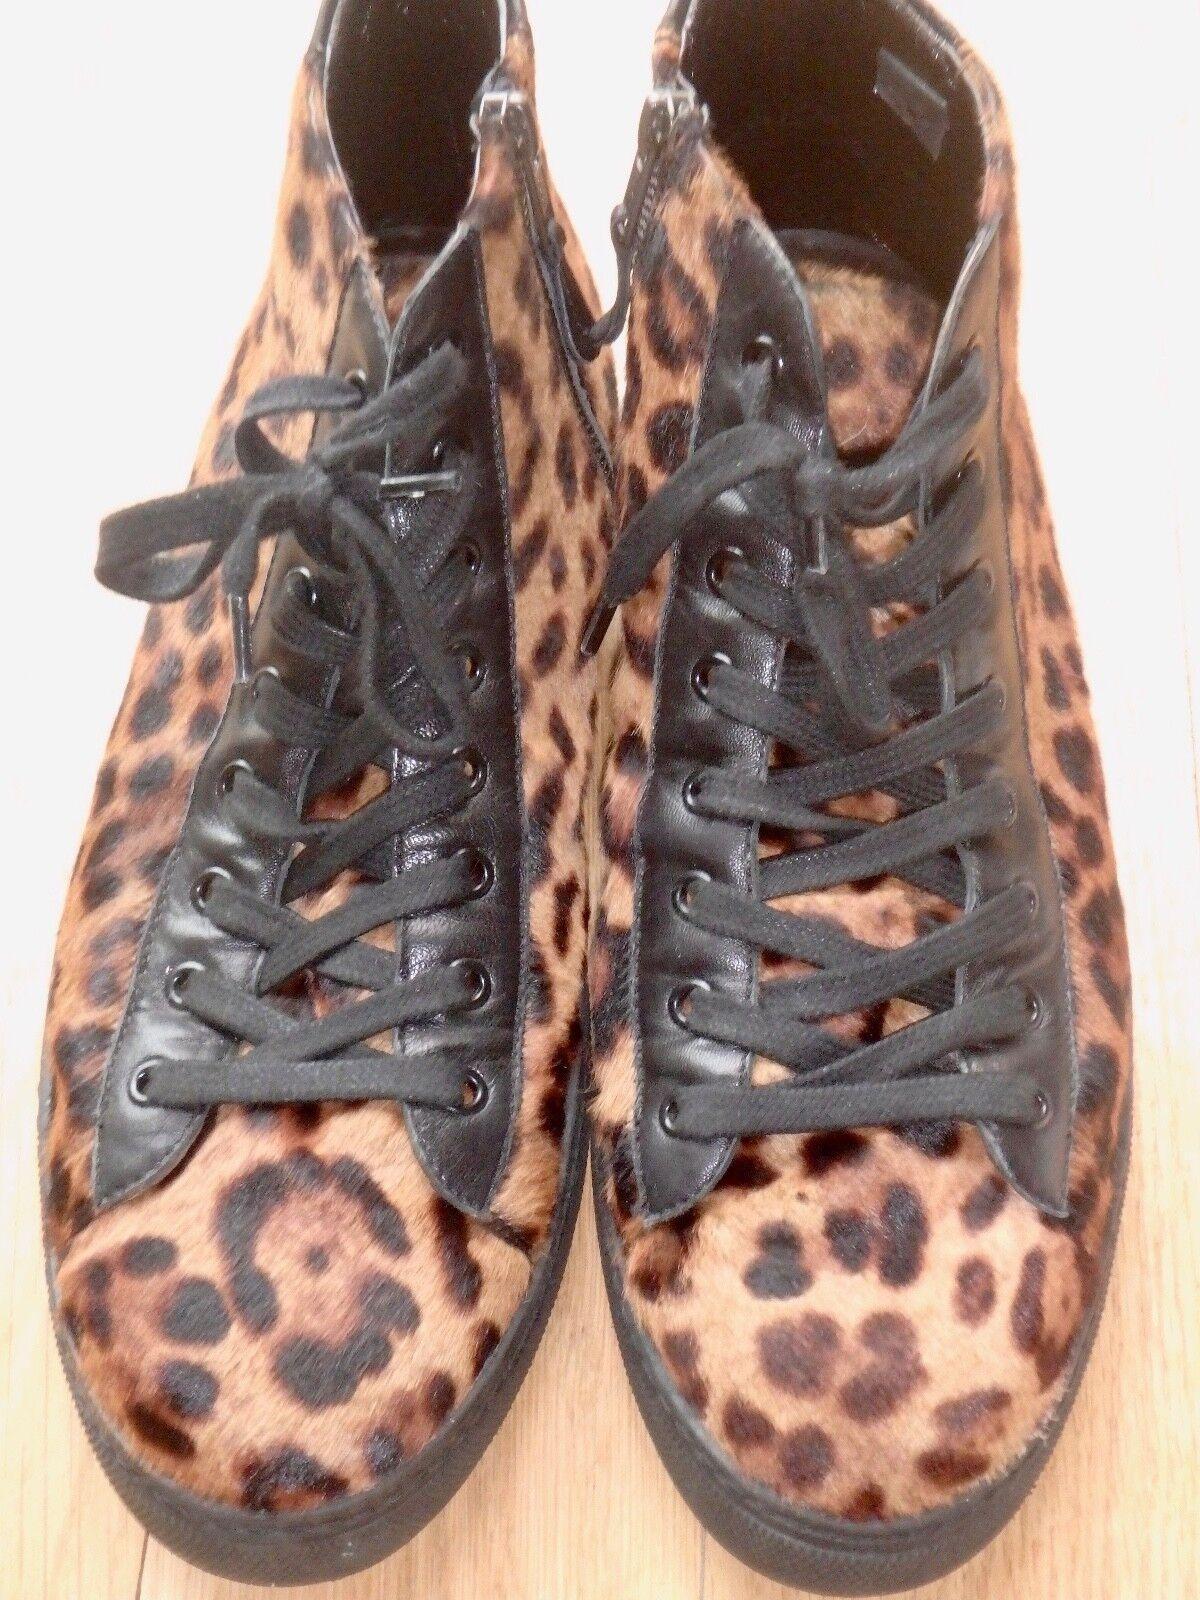 Kardinale Leopard Print   Pony Fur High Top Sneakers - Size 11